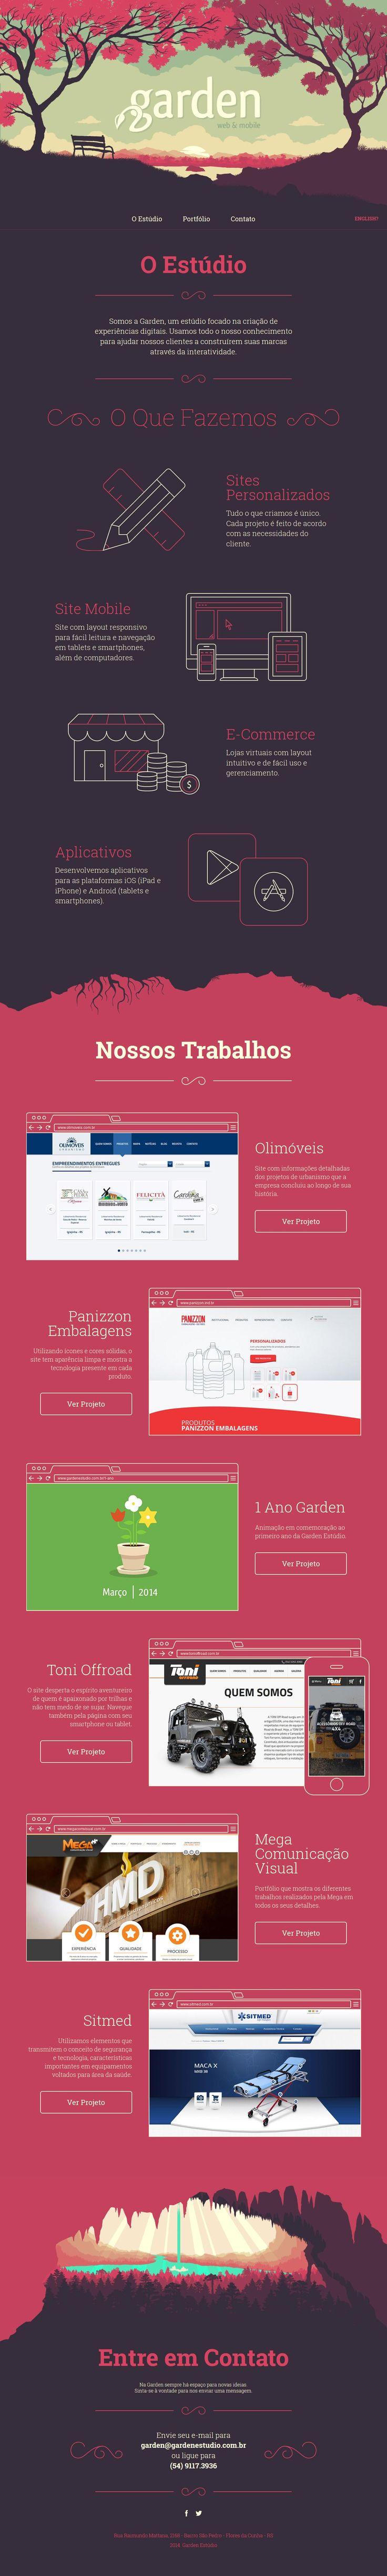 Unqiue Web Design, Garden Estúdio #WebDesign #Design (http://www.pinterest.com/aldenchong/)